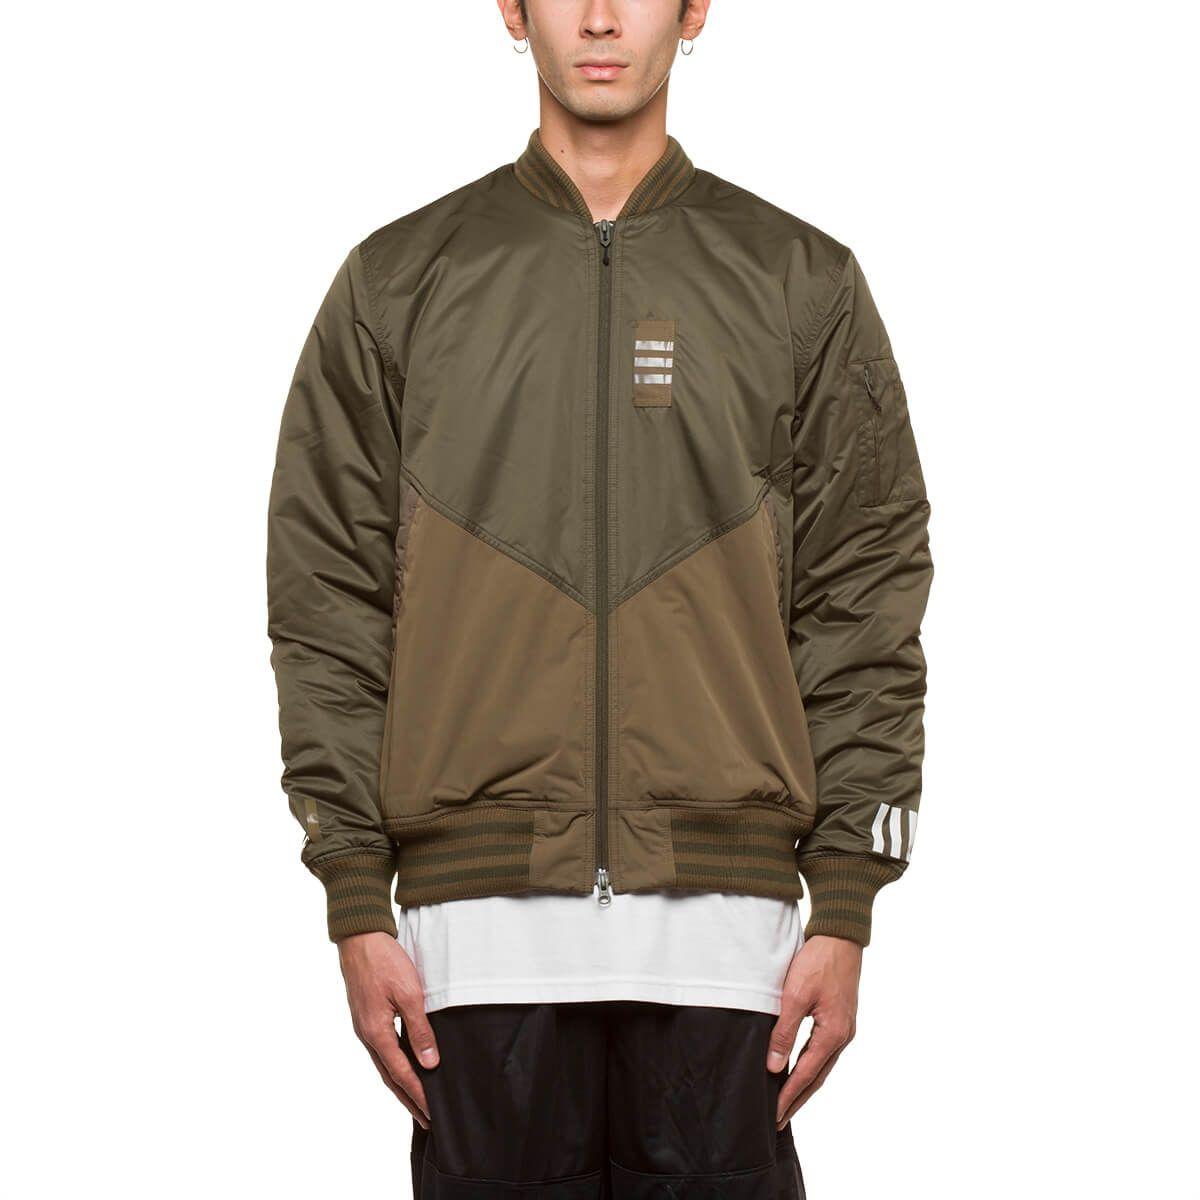 Adidas Originals x White Mountaineering Wm Flight Jacket